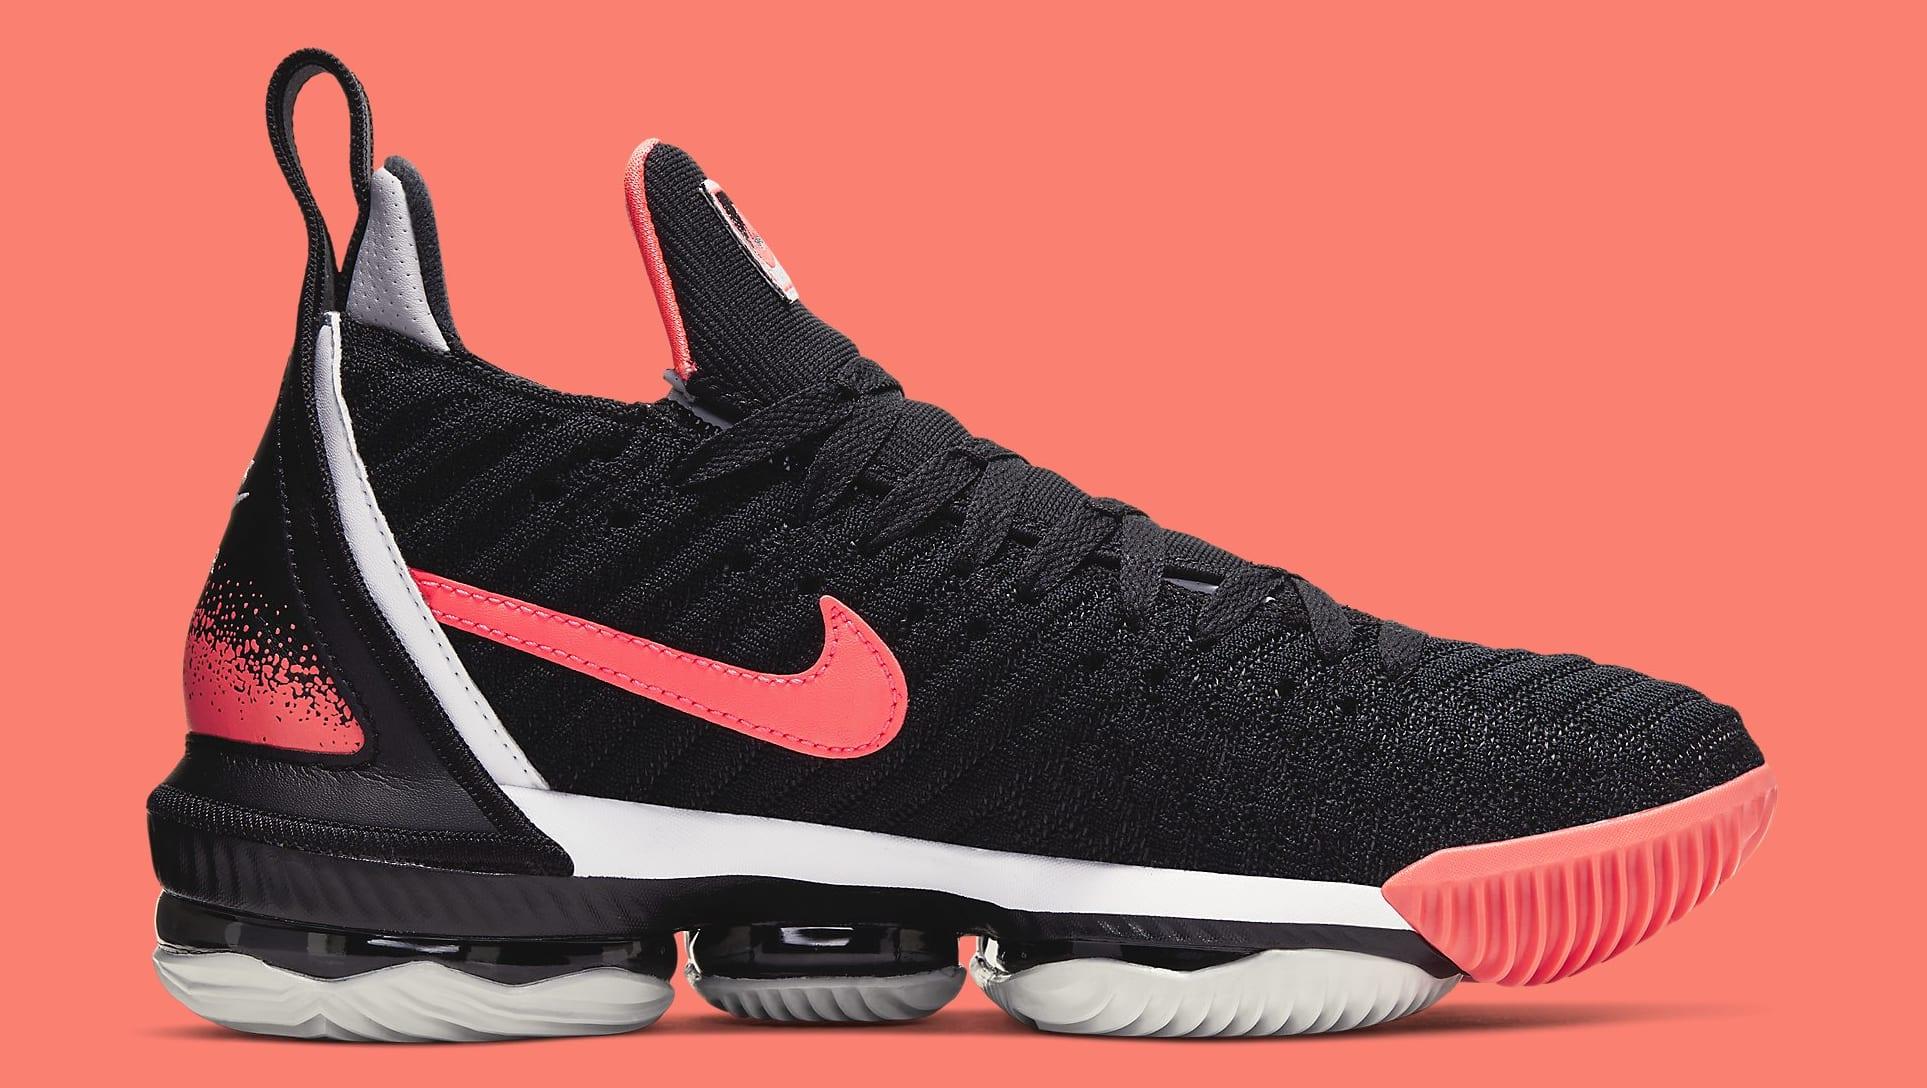 Nike LeBron 16 'Hot Lava' Black CI1521-001 Medial